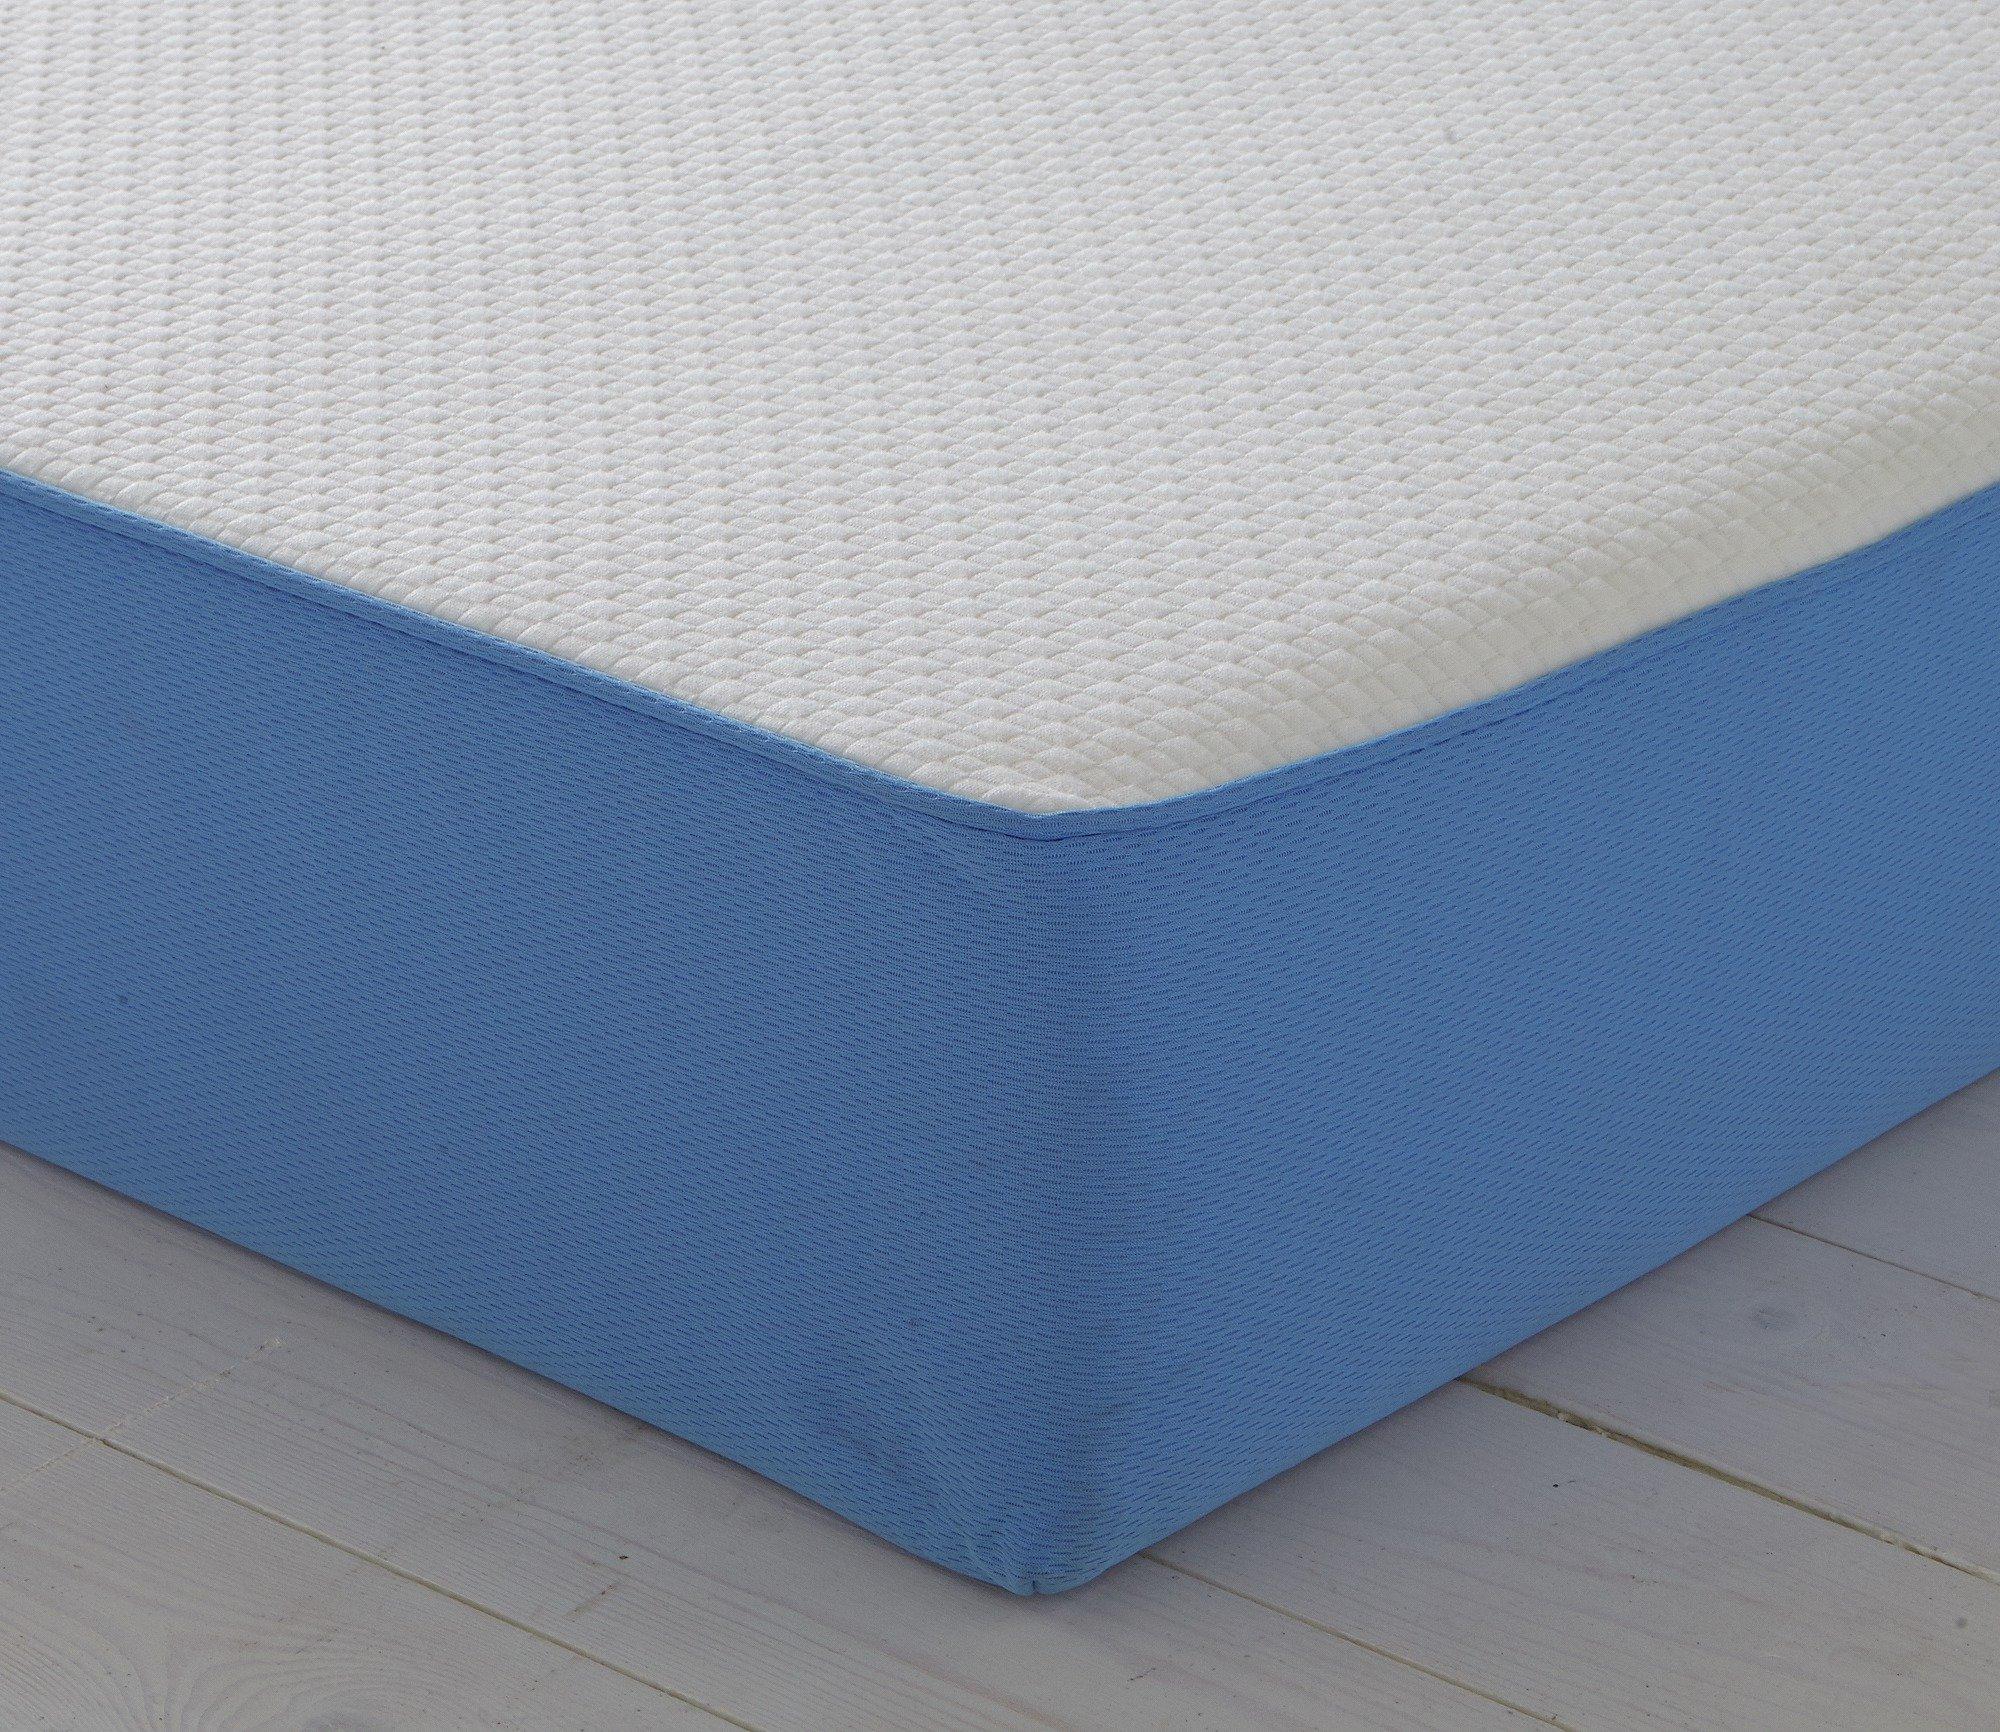 Image of I-Sleep Kovo Pocket Cool Memory Foam Kingsize Mattress